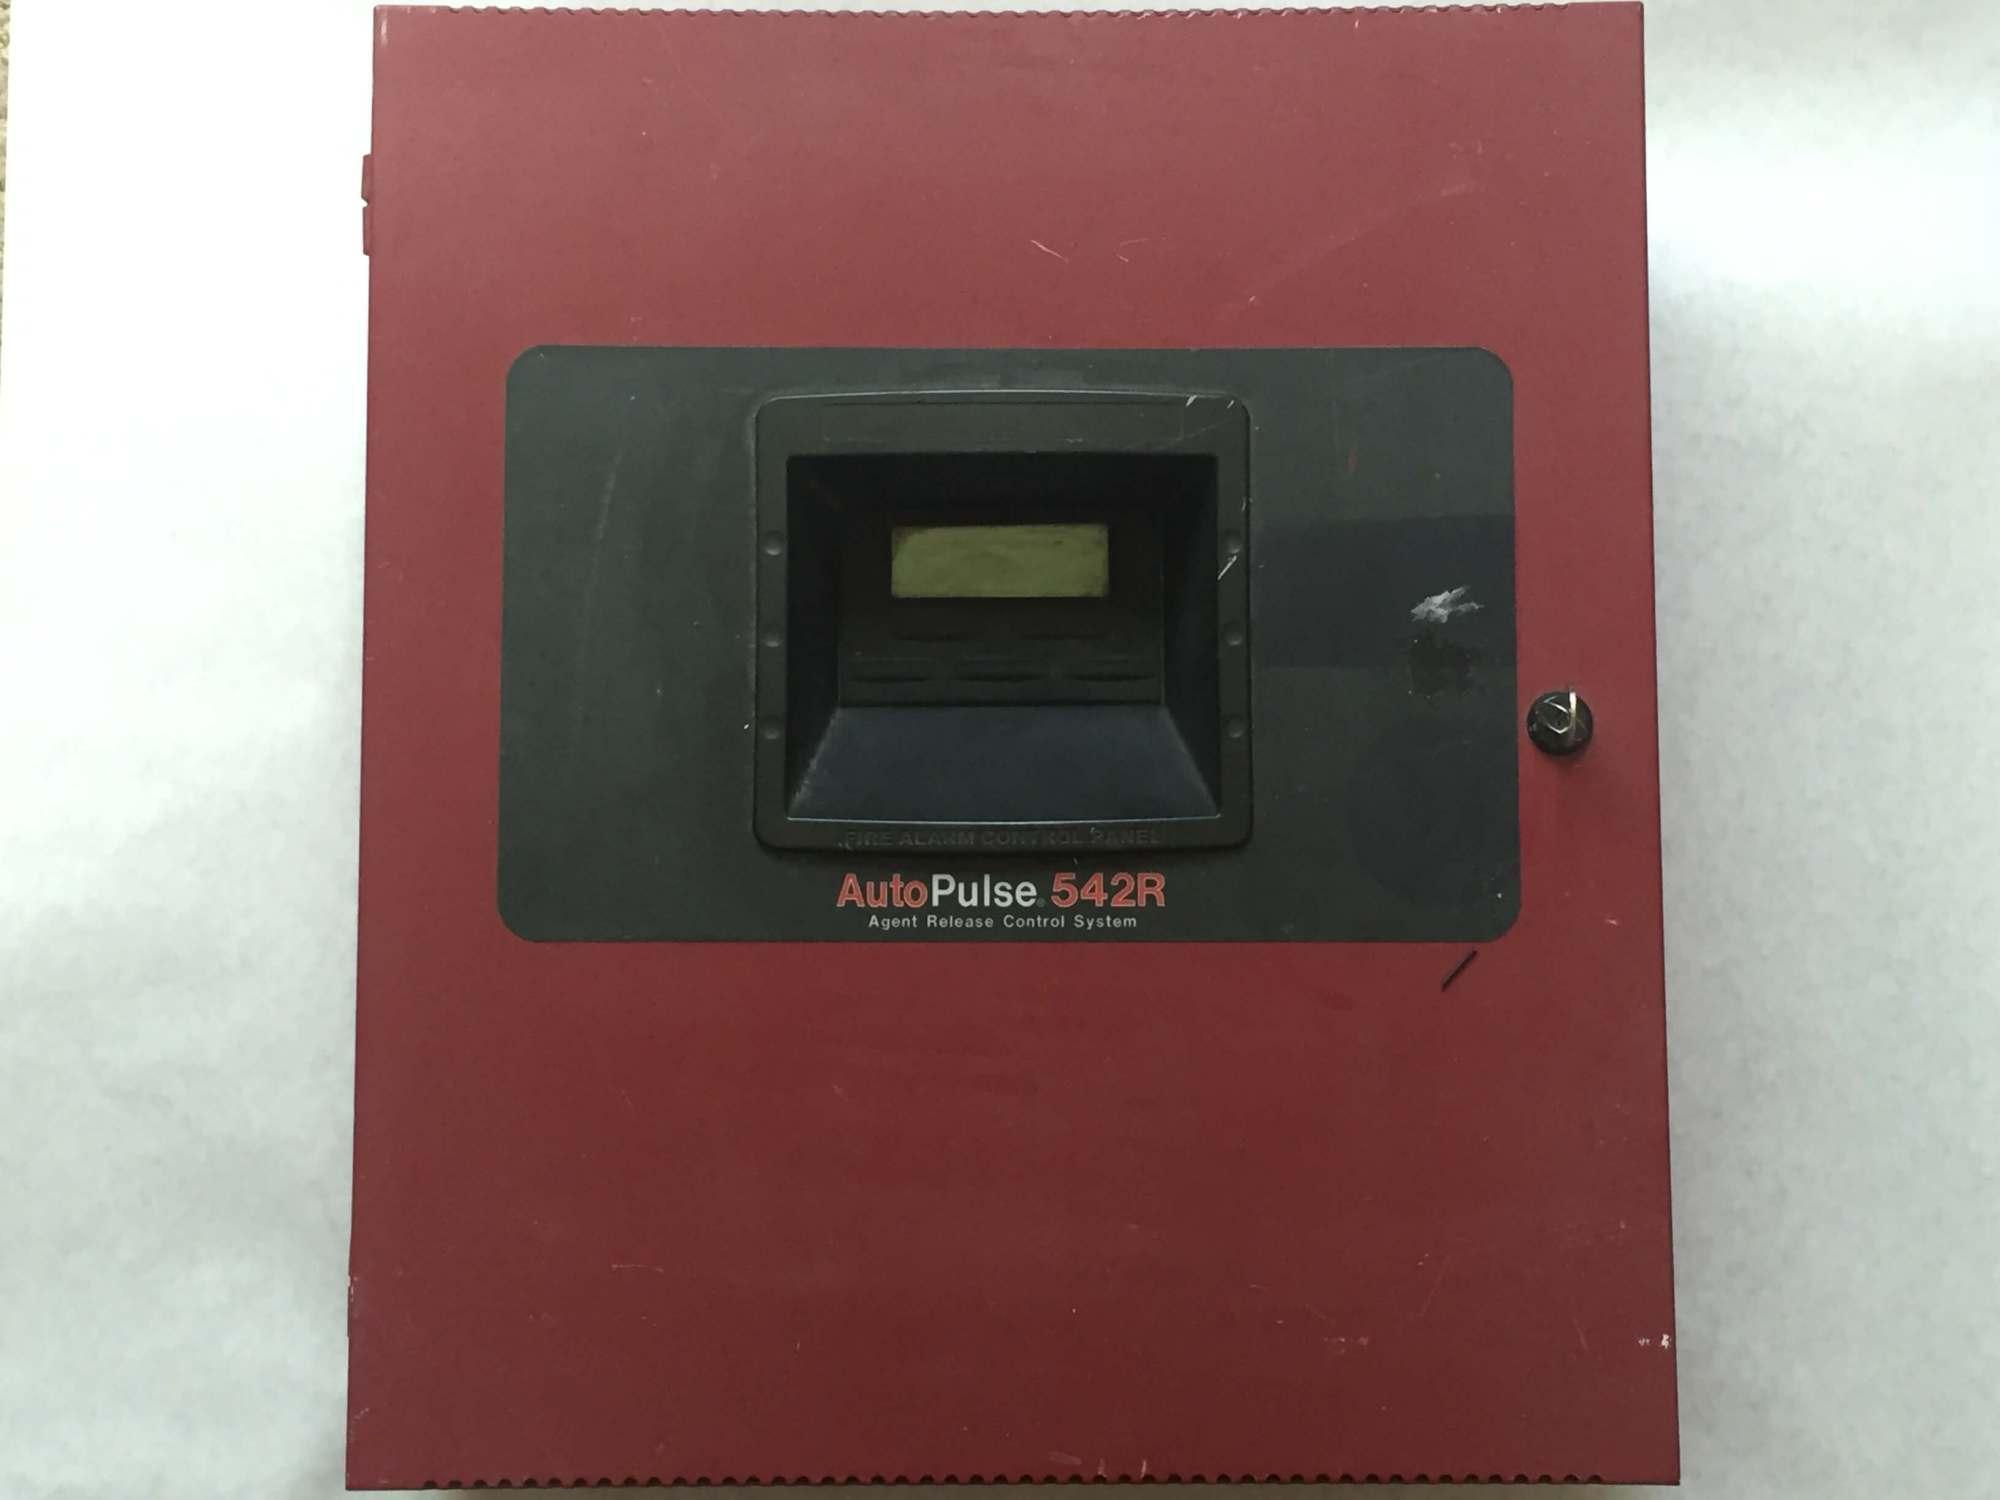 hight resolution of ansul autopulse 542r